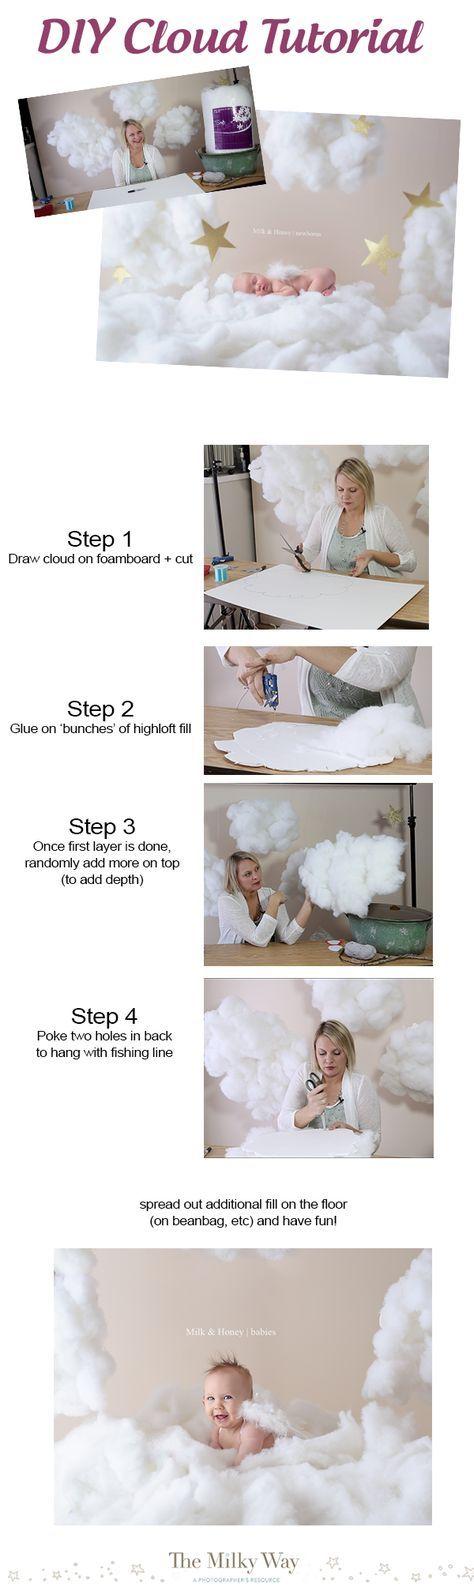 Fun DIY Cloud Tutorial (takes less than 20 minutes!) - themilkway.ca